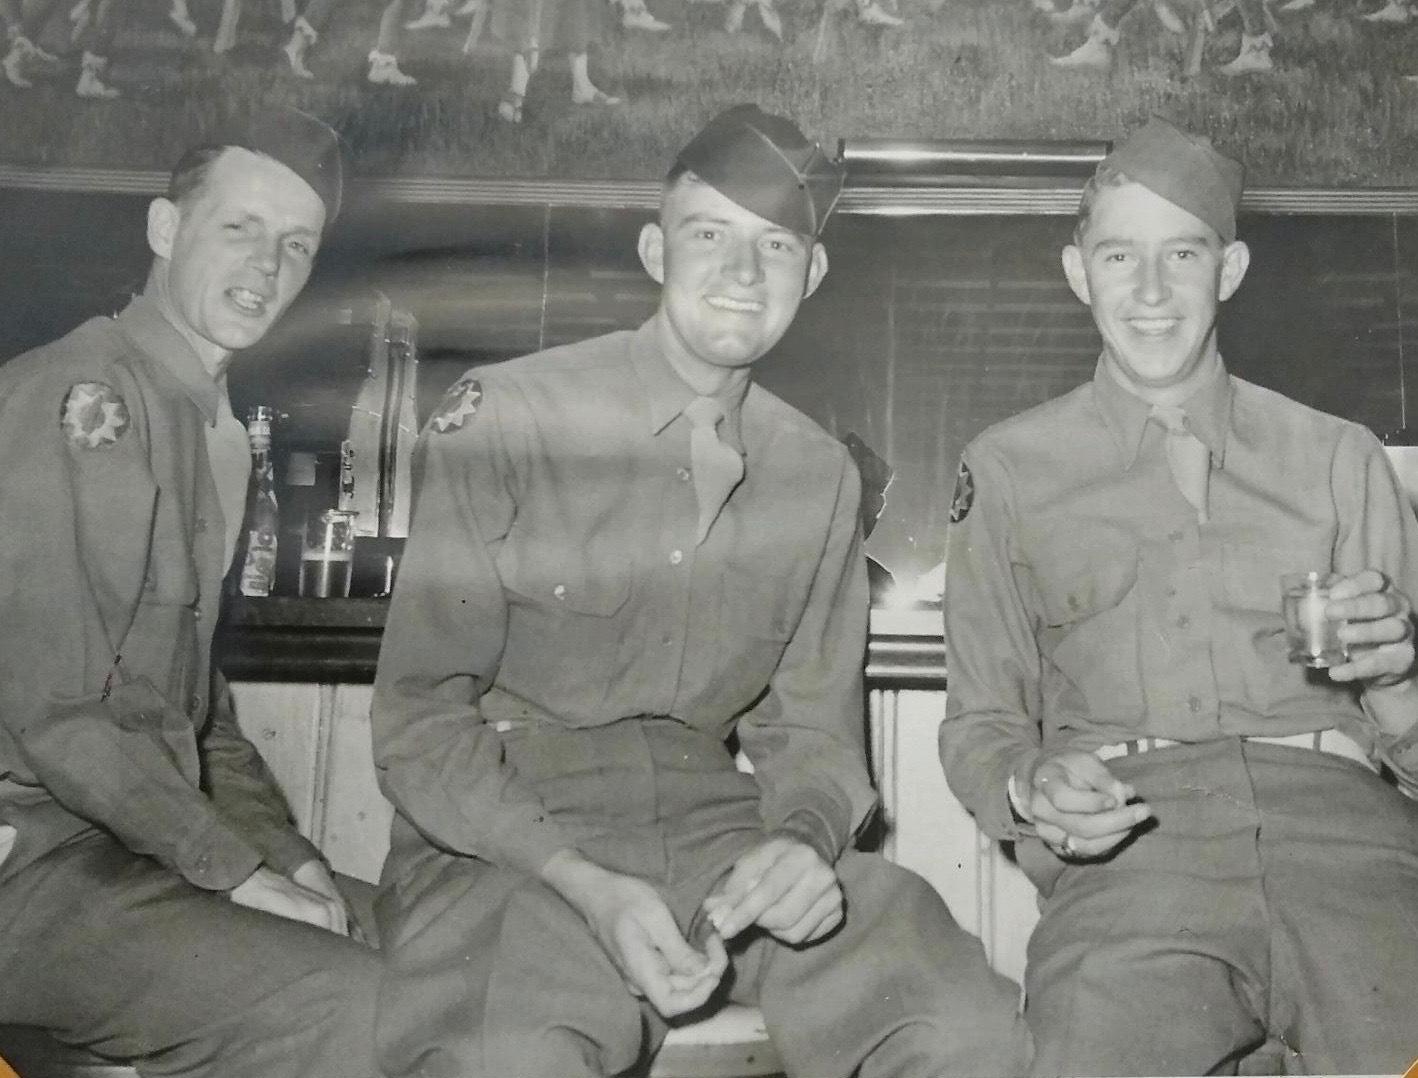 Nursing Home Veterans Locked Inside on Memorial Day